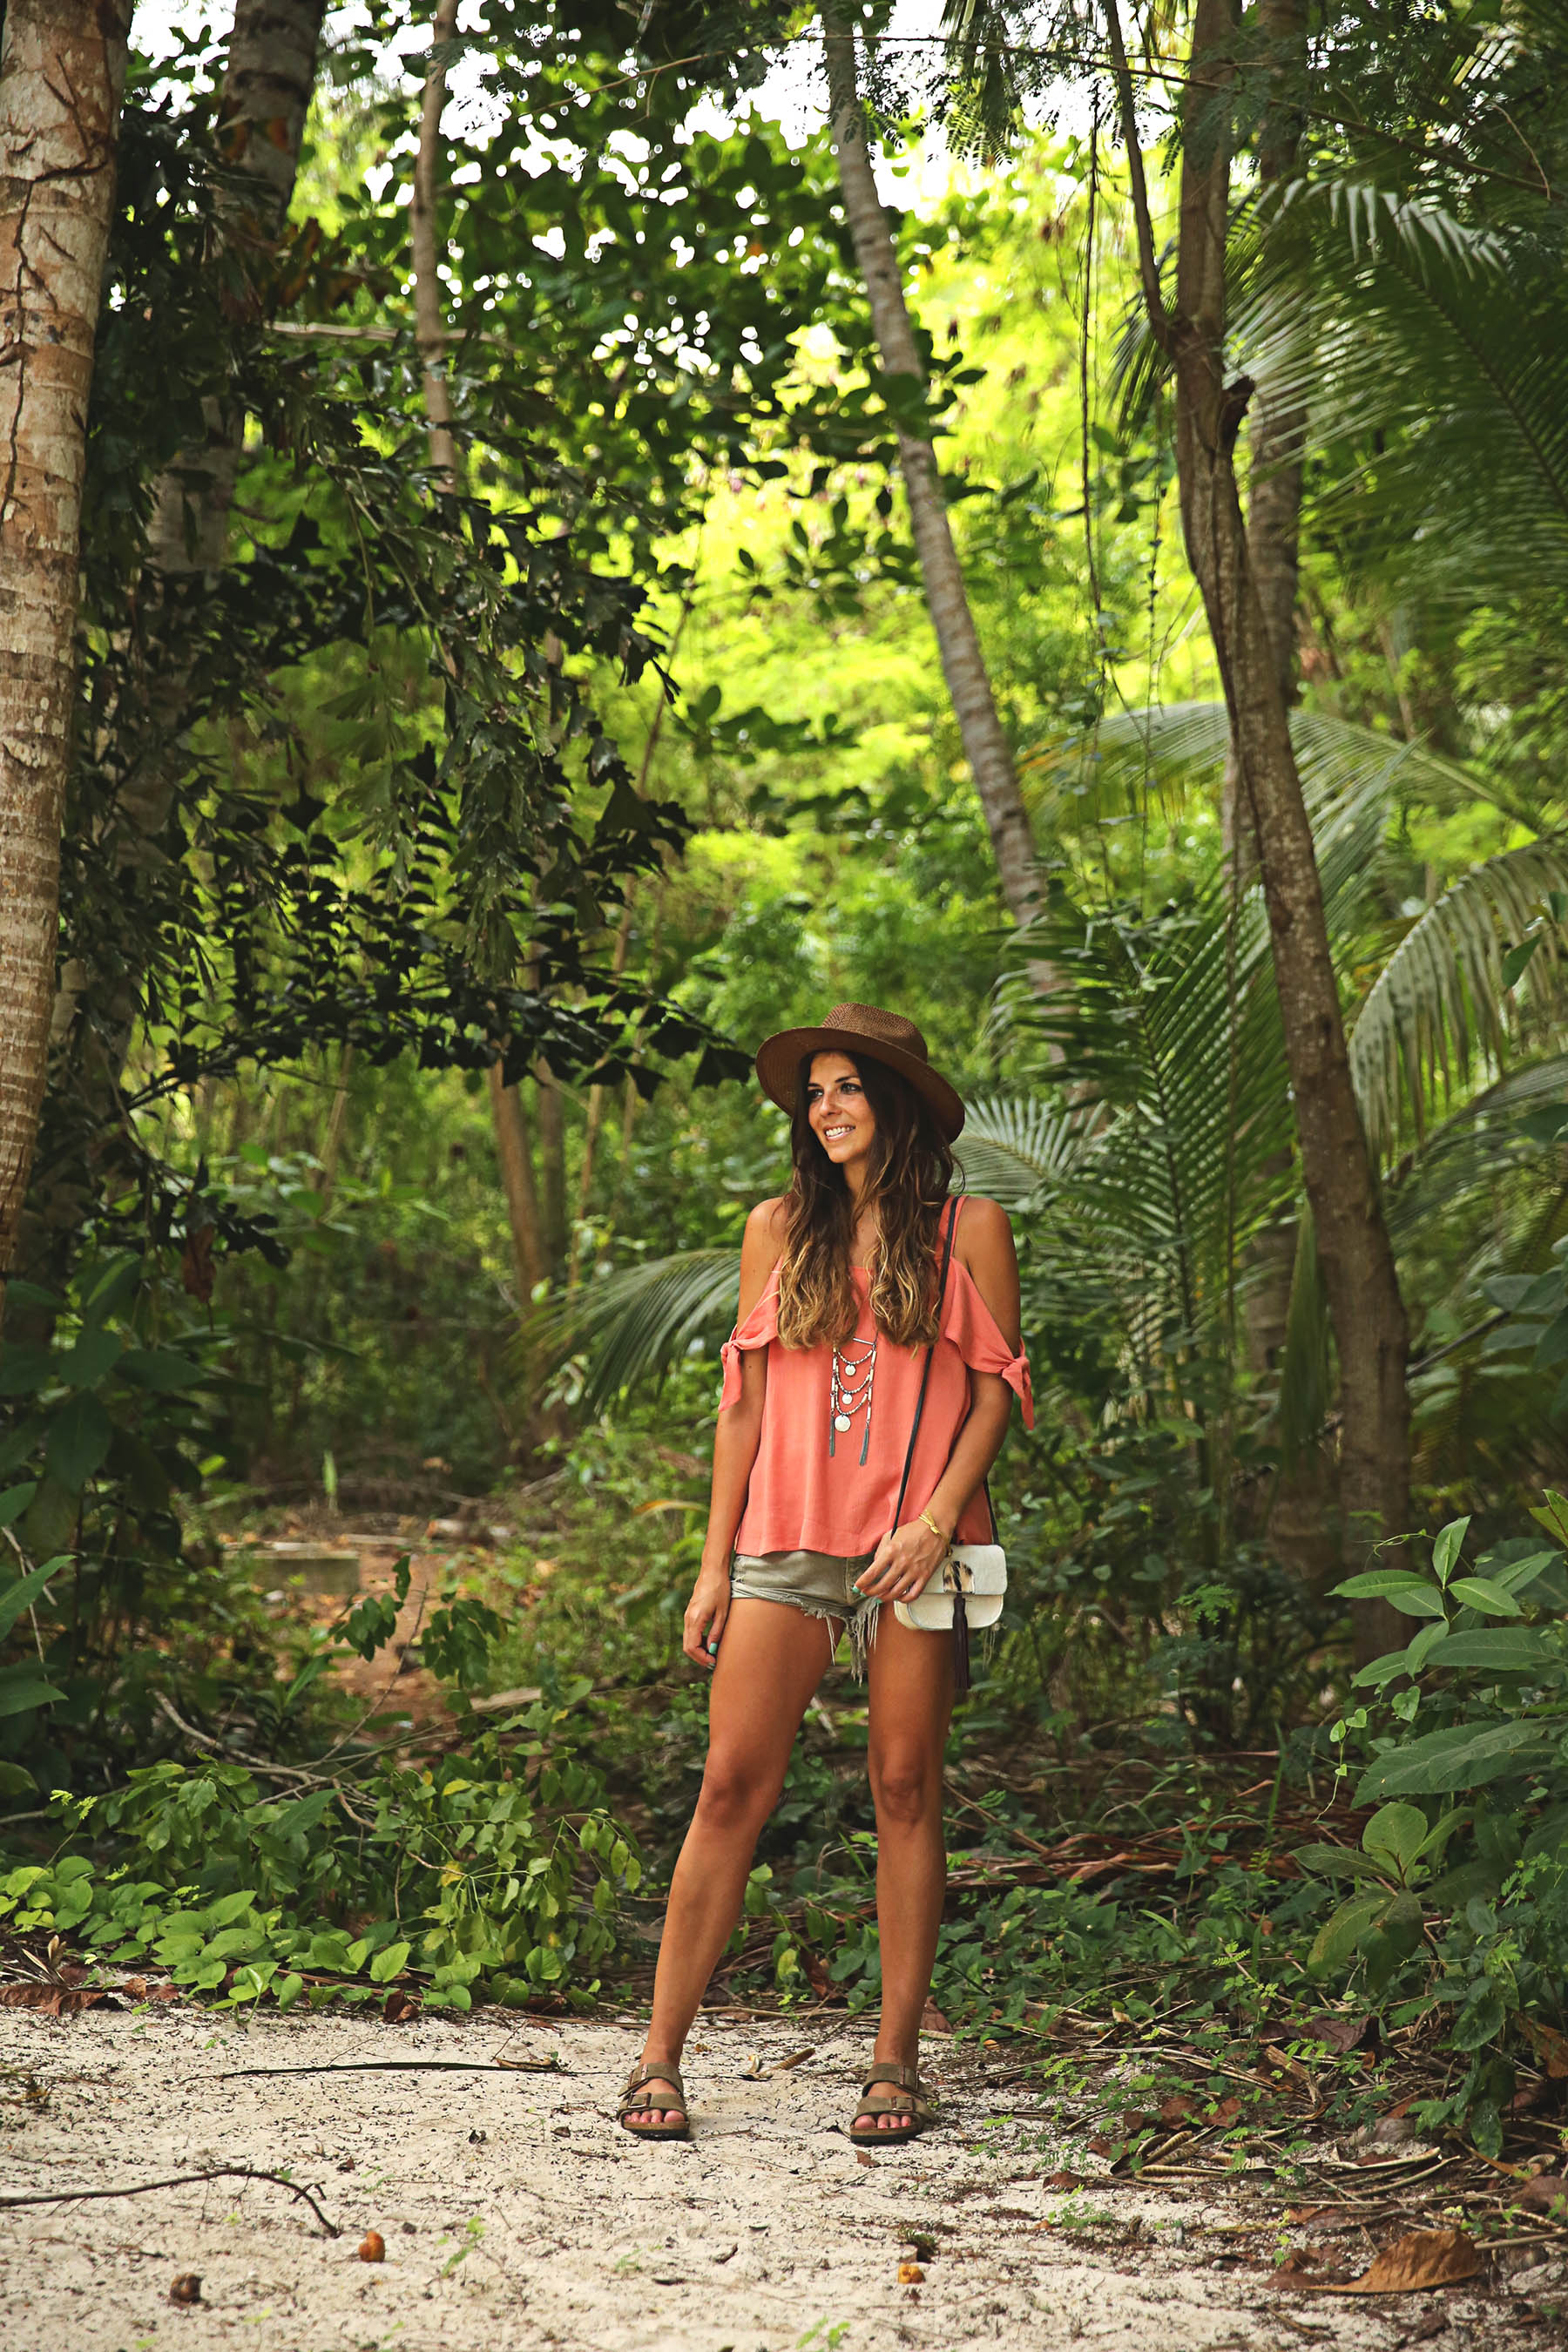 trendy-taste-look-outfit-street-style-ootd-blog-blogger-fashion-spain-moda-españa-boho-hippie-verano-birkenstock-bavaro-barcelo-khaki-caqui-shorts-sombrero-top-10